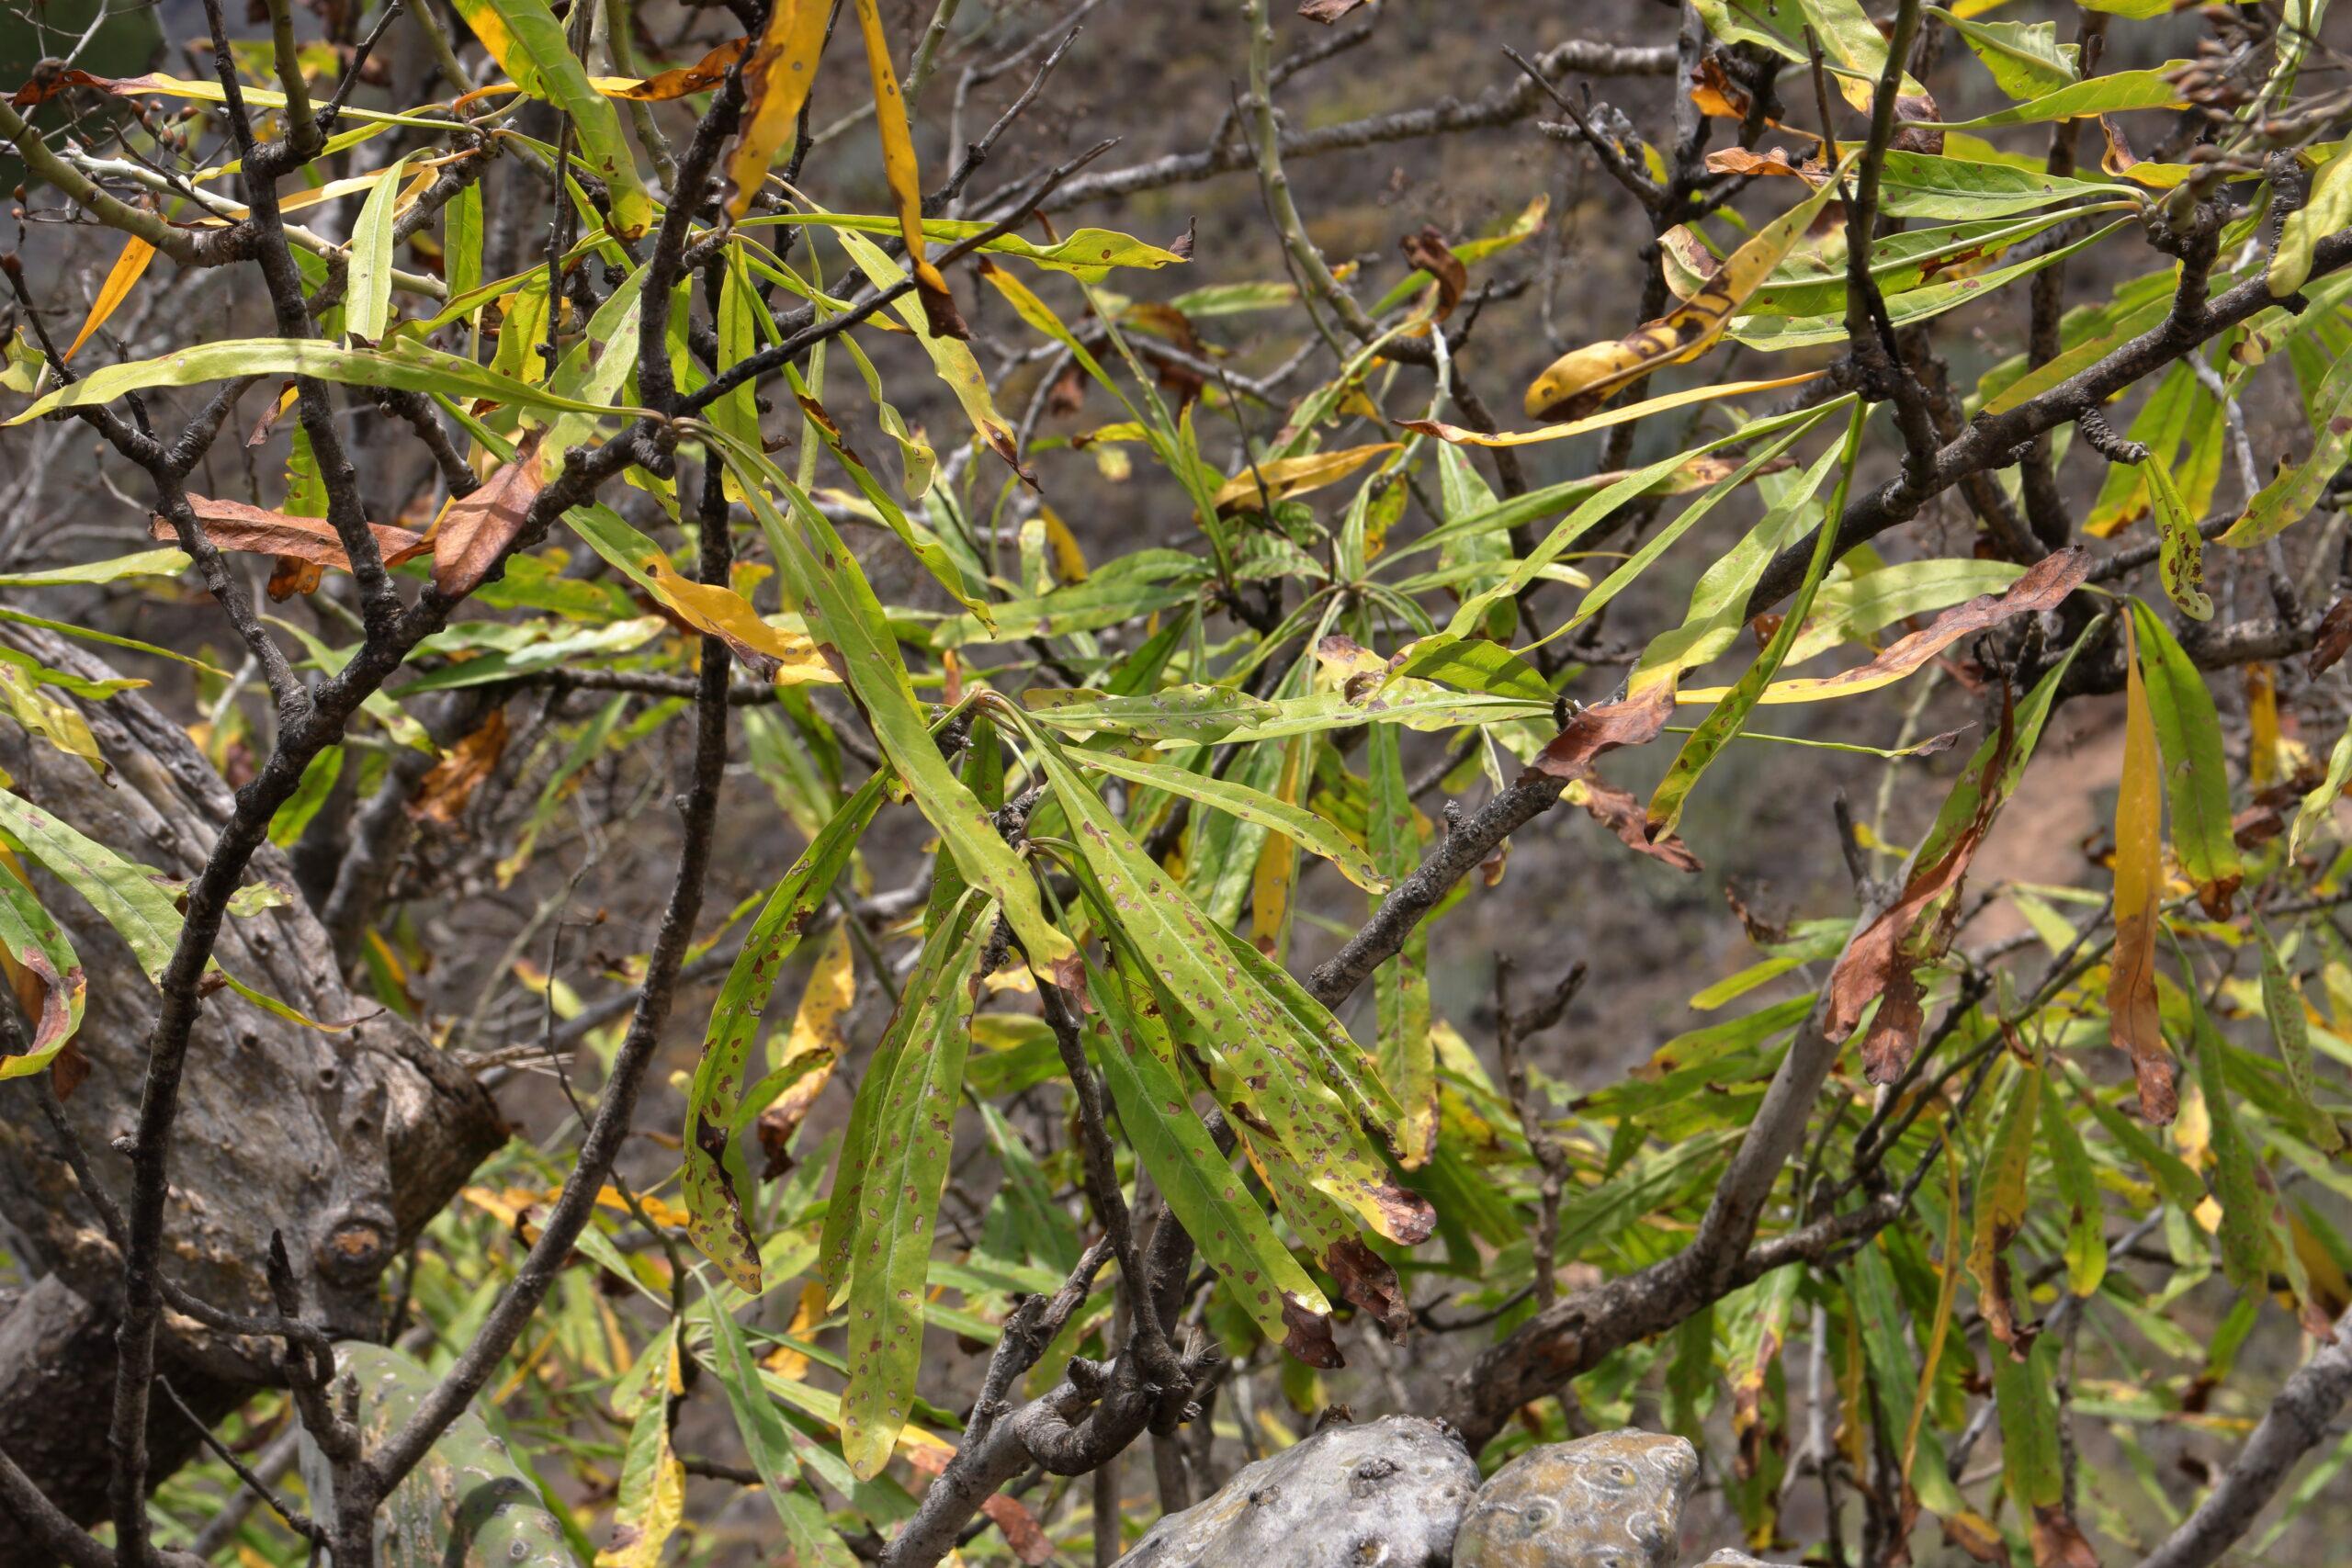 img_0419-convolvulus-floridus-hojas-2-scaled.jpg